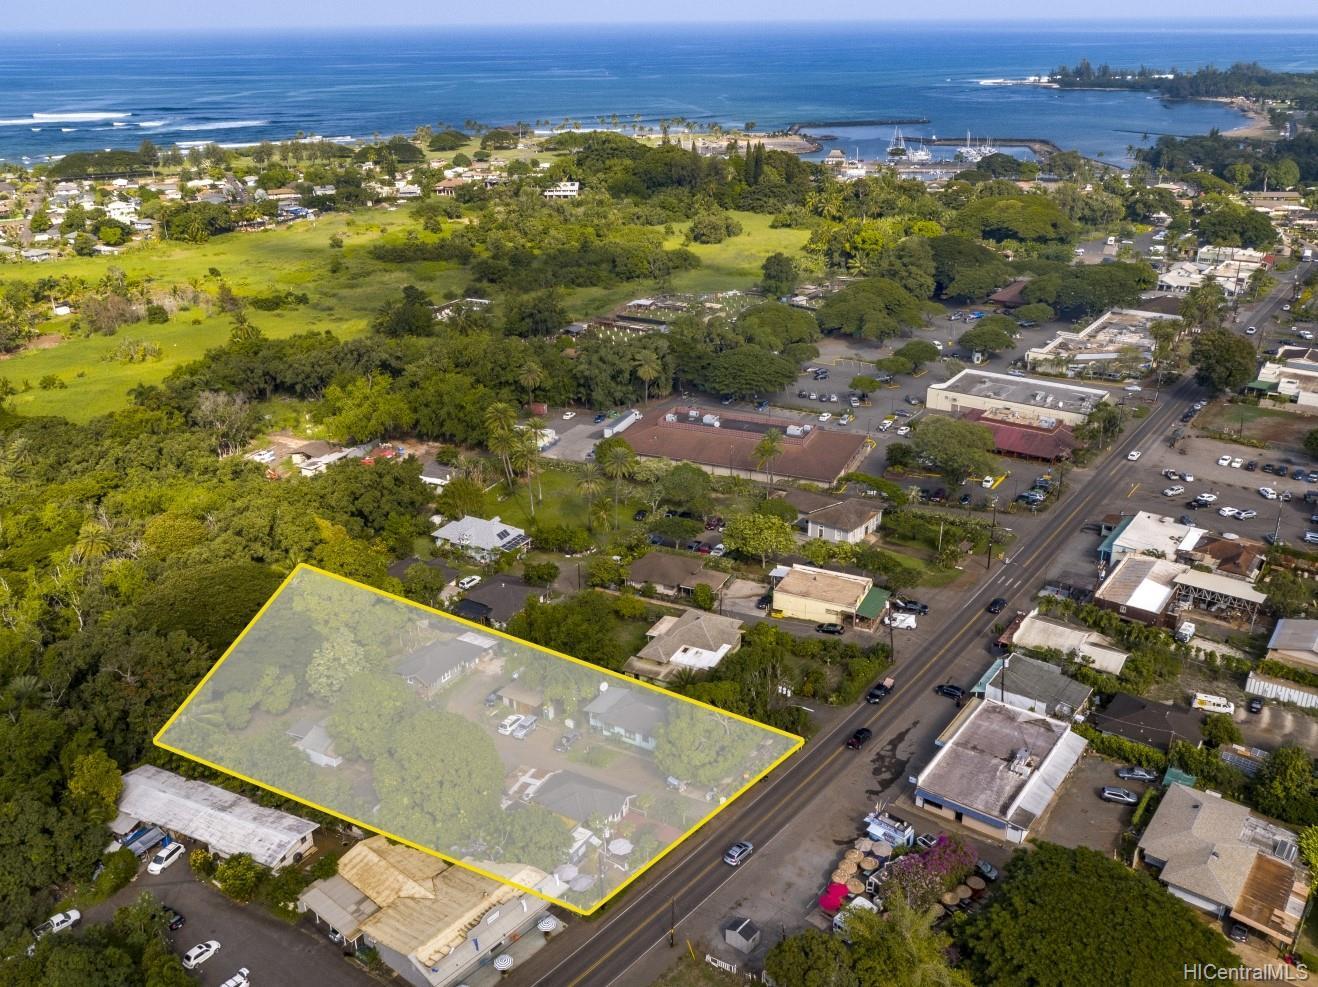 66-239 Kamehameha Hwy Haleiwa Oahu commercial real estate photo2 of 7